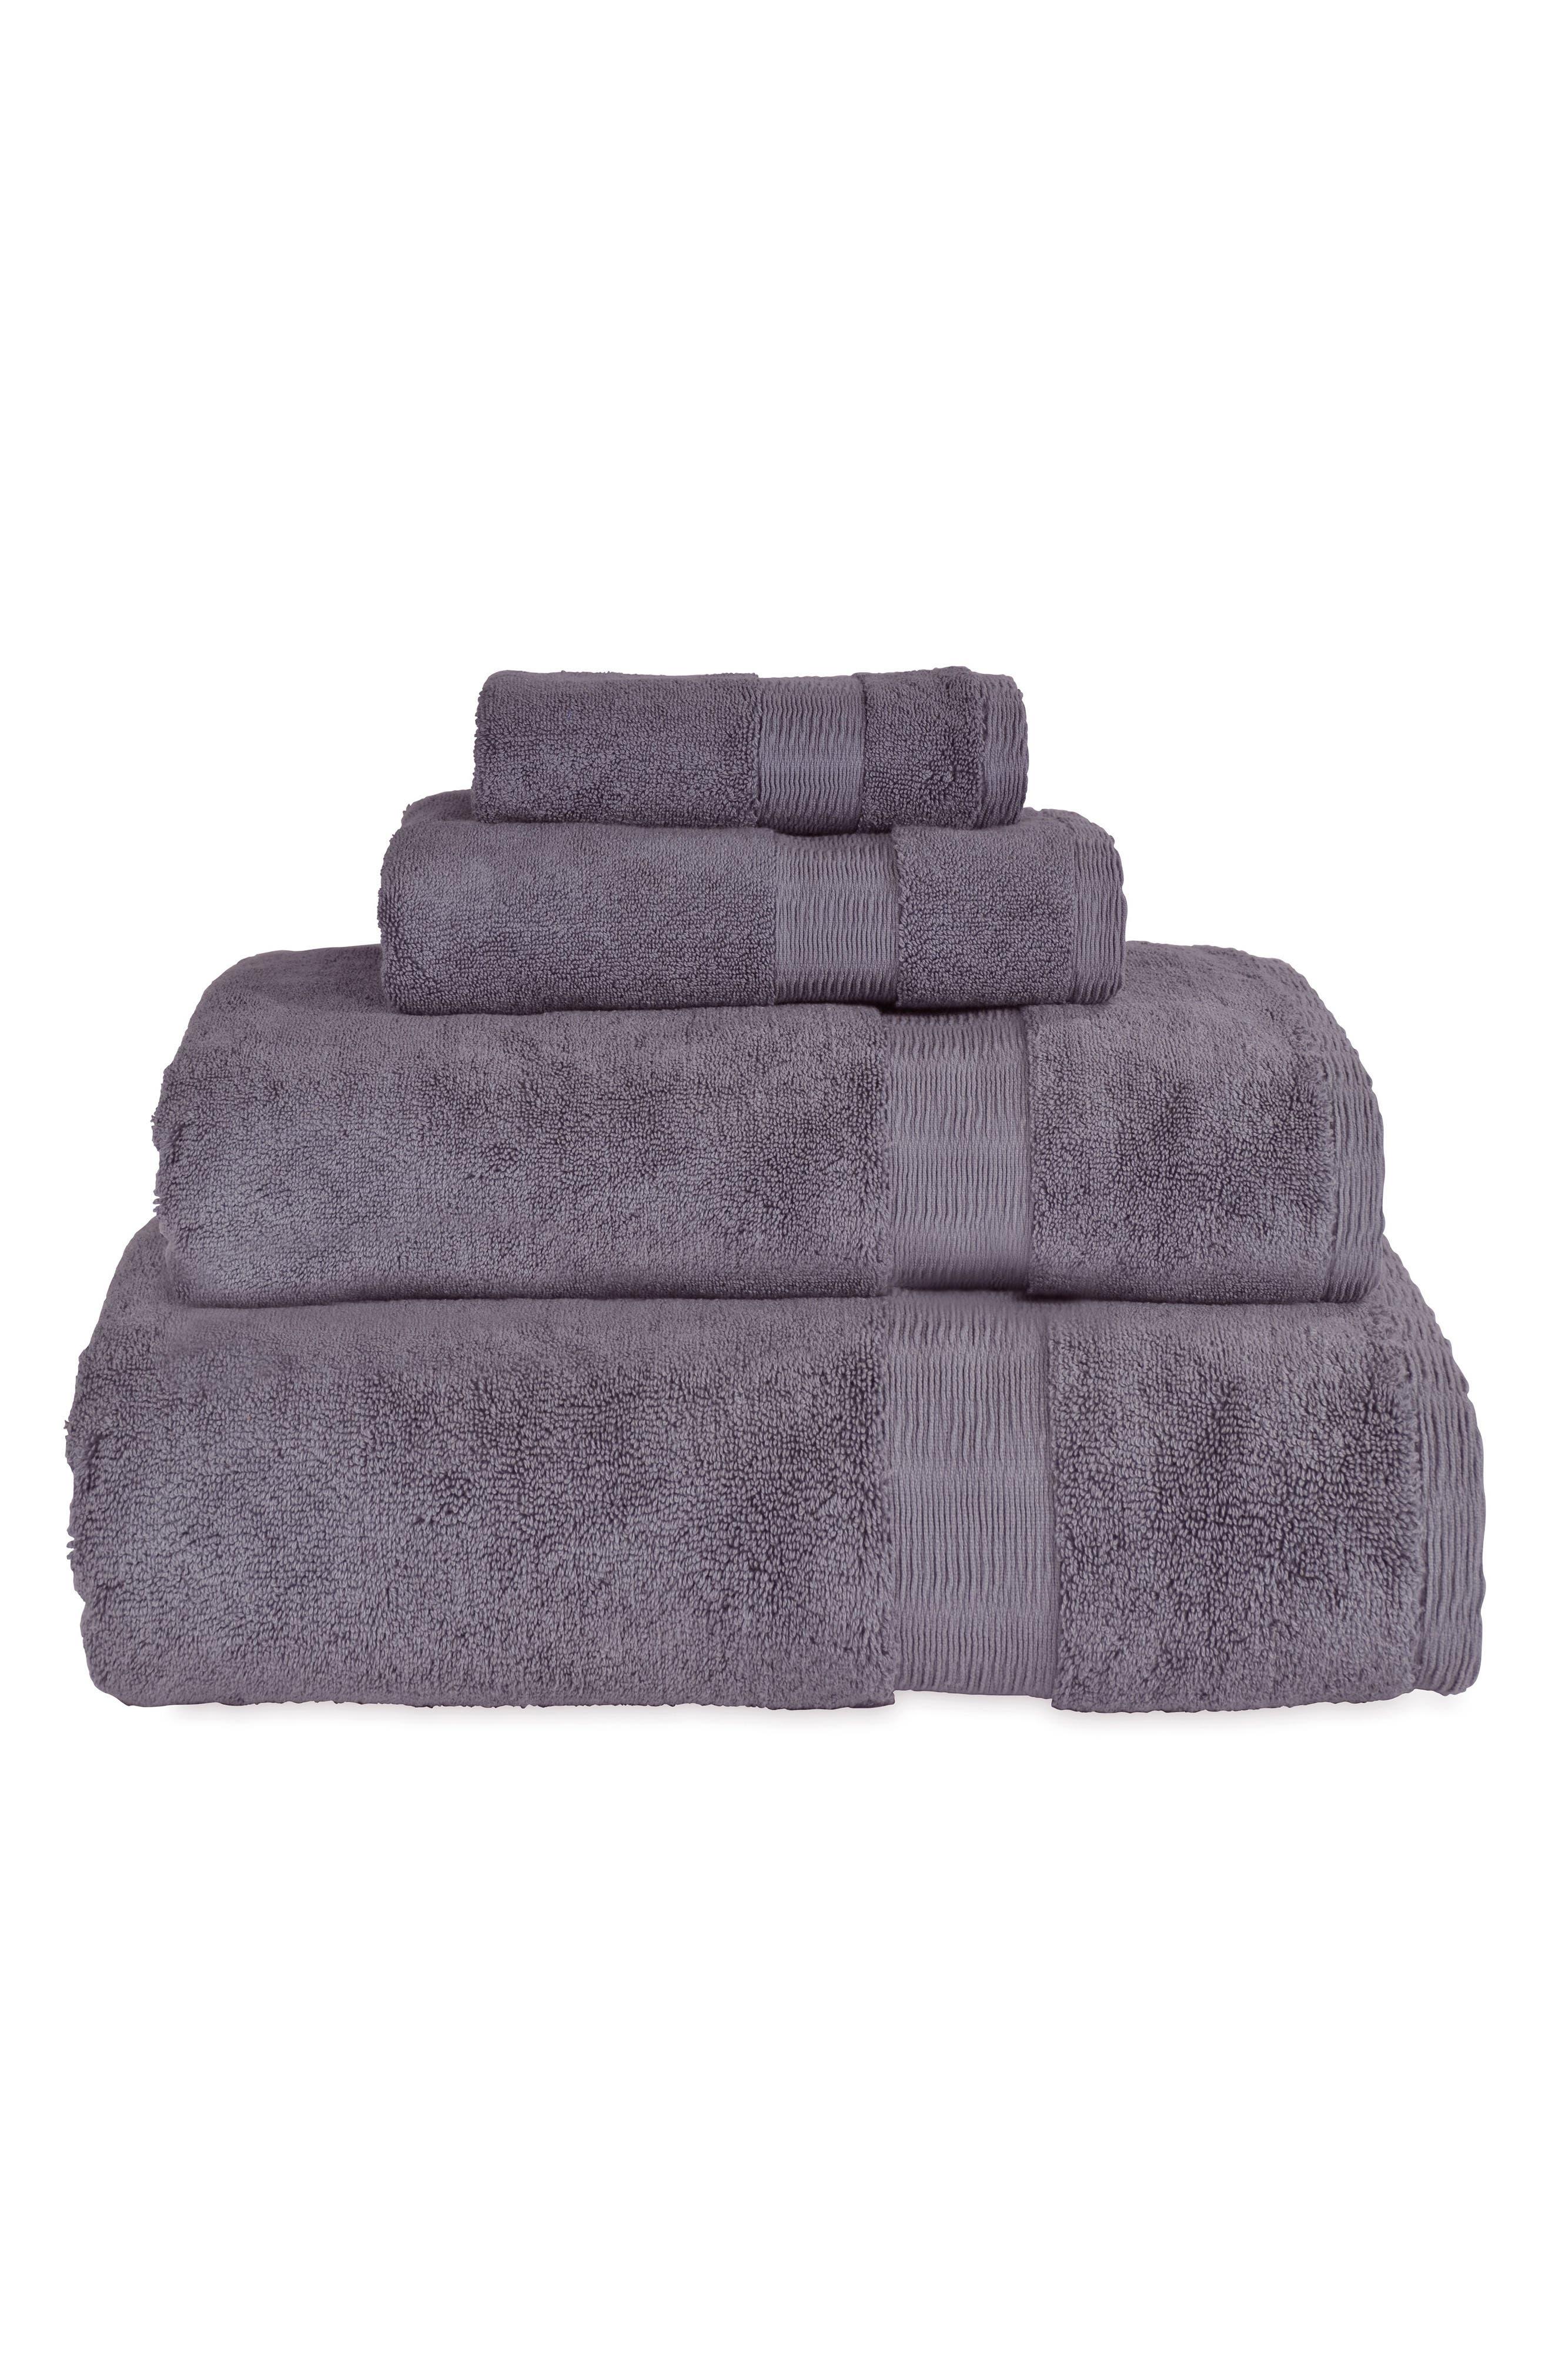 Mercer Bath Towel,                             Alternate thumbnail 2, color,                             Dusty Lavender